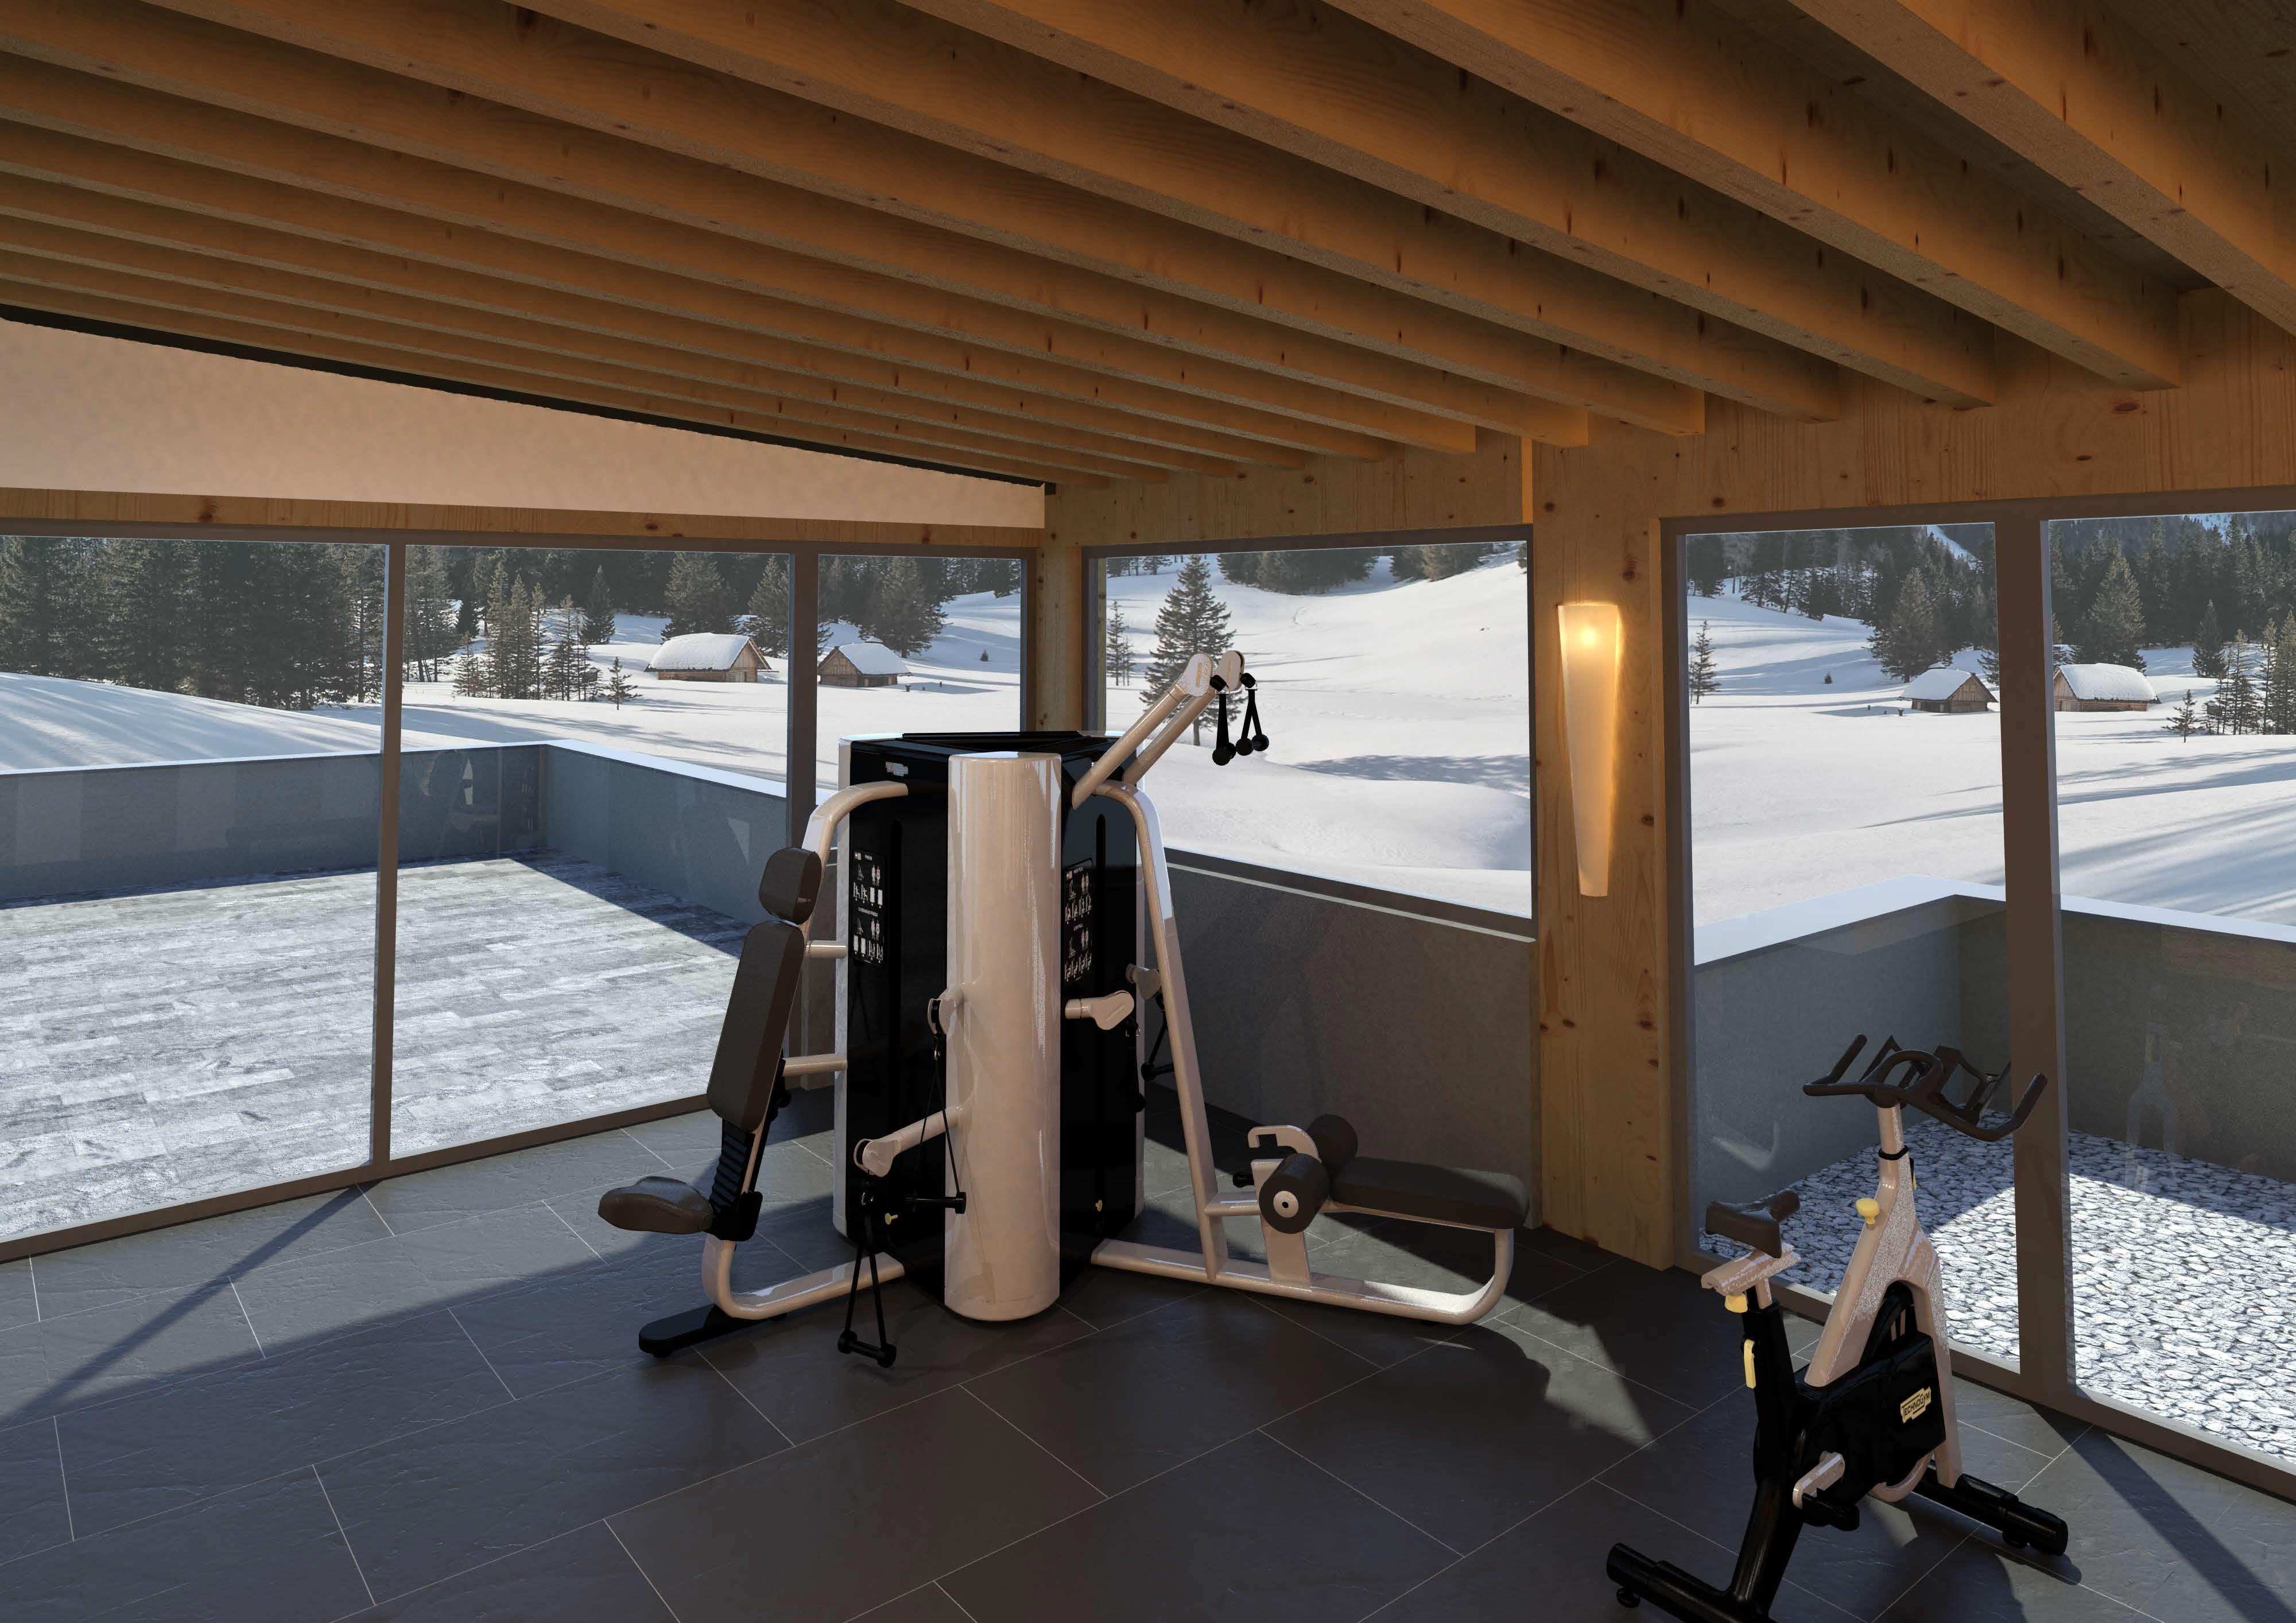 fitnessraum zuhause badezimmer schlafzimmer sessel m bel design ideen. Black Bedroom Furniture Sets. Home Design Ideas